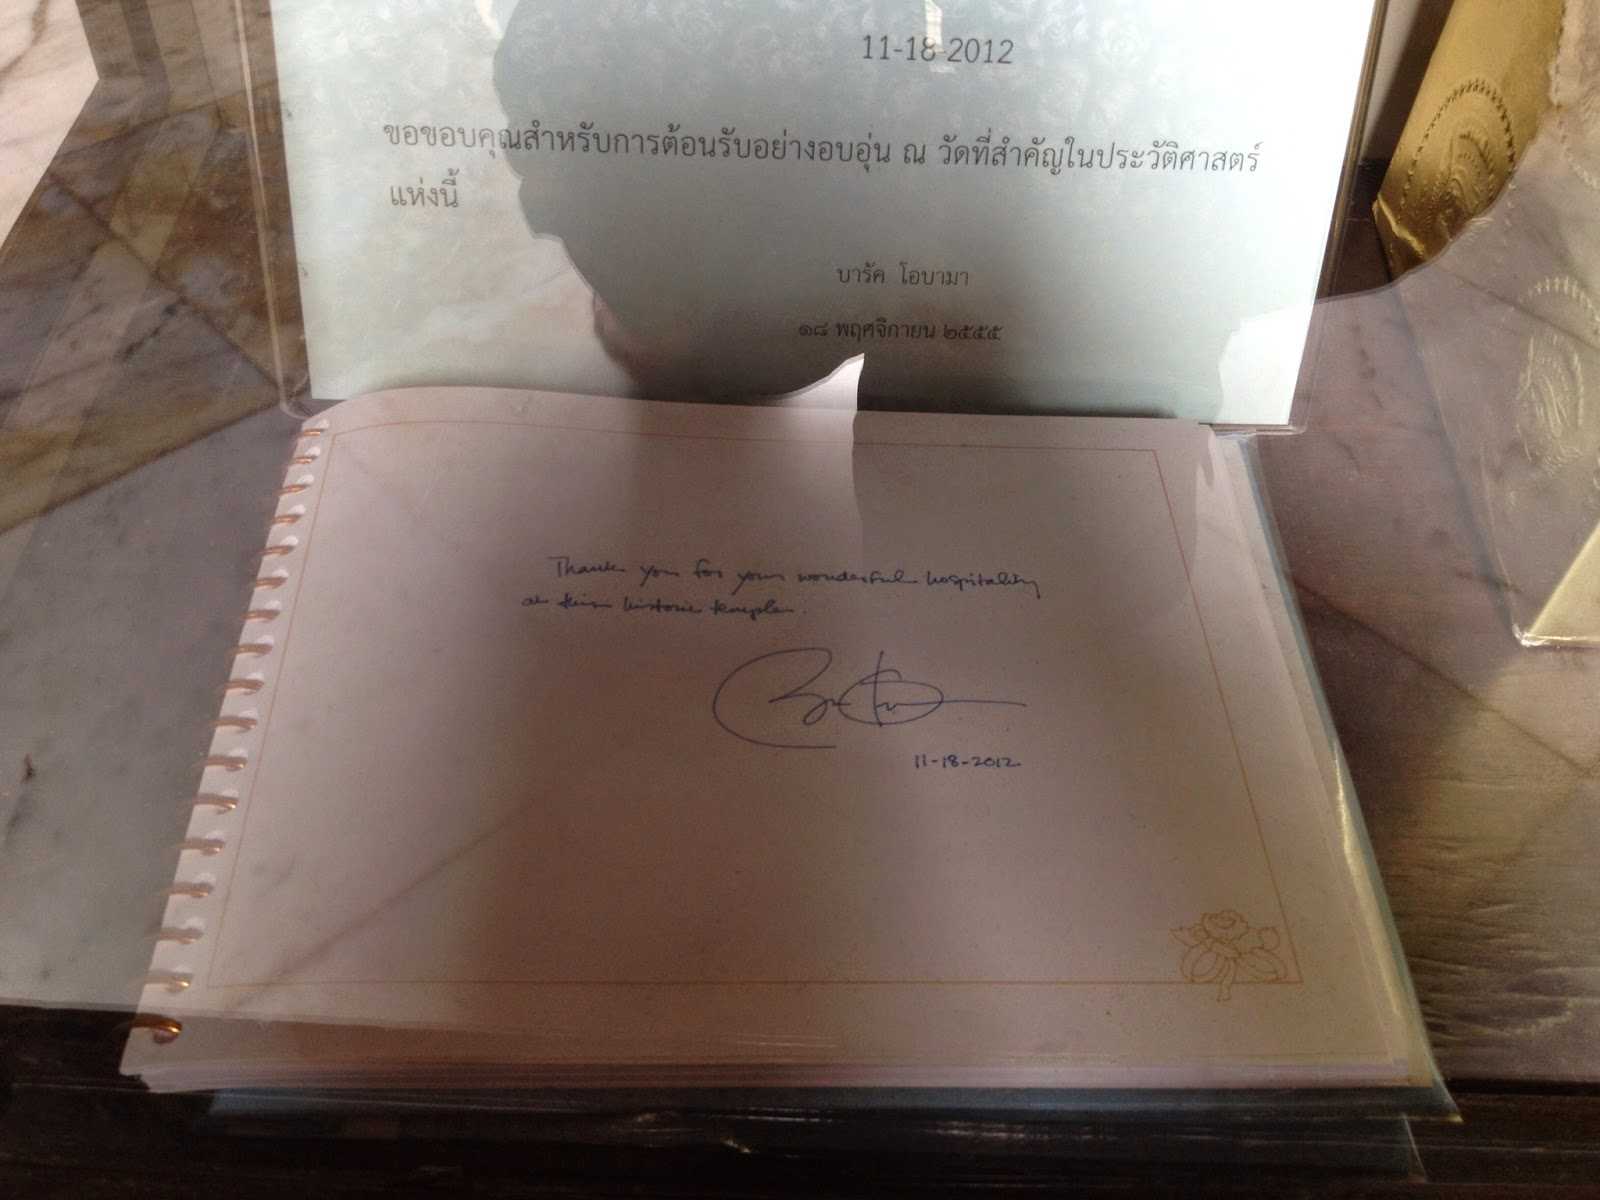 Bangkok - President Obama visited